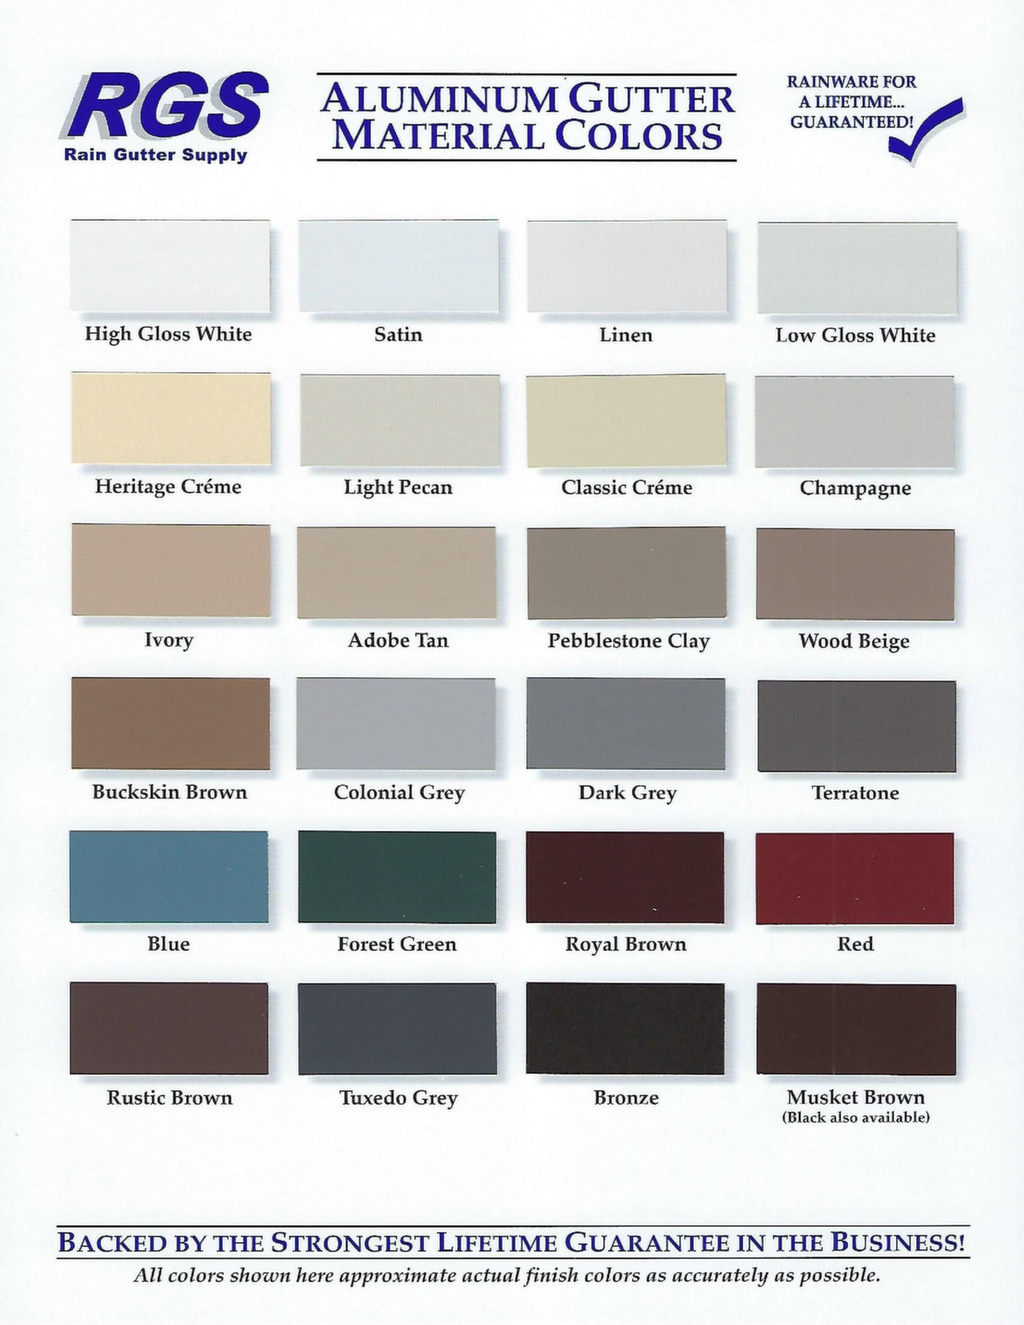 Rain Gutter Colors & Types | Custom Rain Gutter Los Angeles